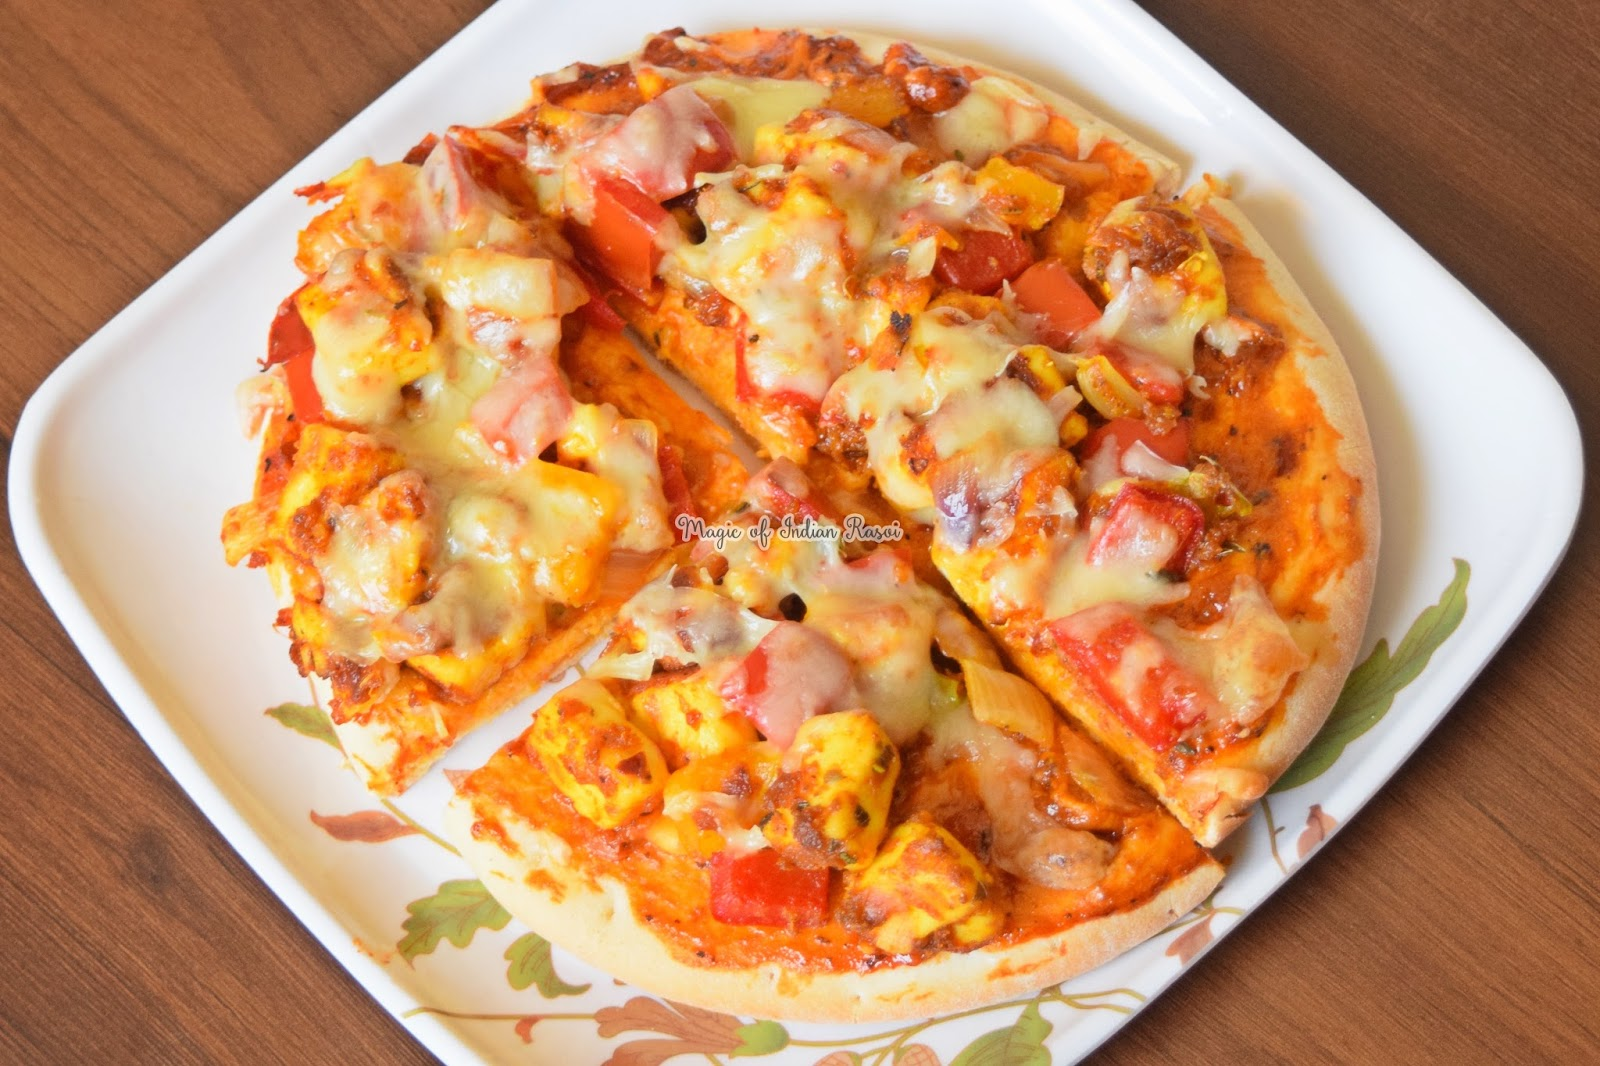 Paneer Tikka Pizza Recipe - Homemade Paneer Pizza without Tandoor - पनीर टिक्का पिज़्ज़ा रेसिपी - तंदूर के बिना घर पे बनाये पनीर पिज़्ज़ा - Priya R - Magic of Indian Rasoi